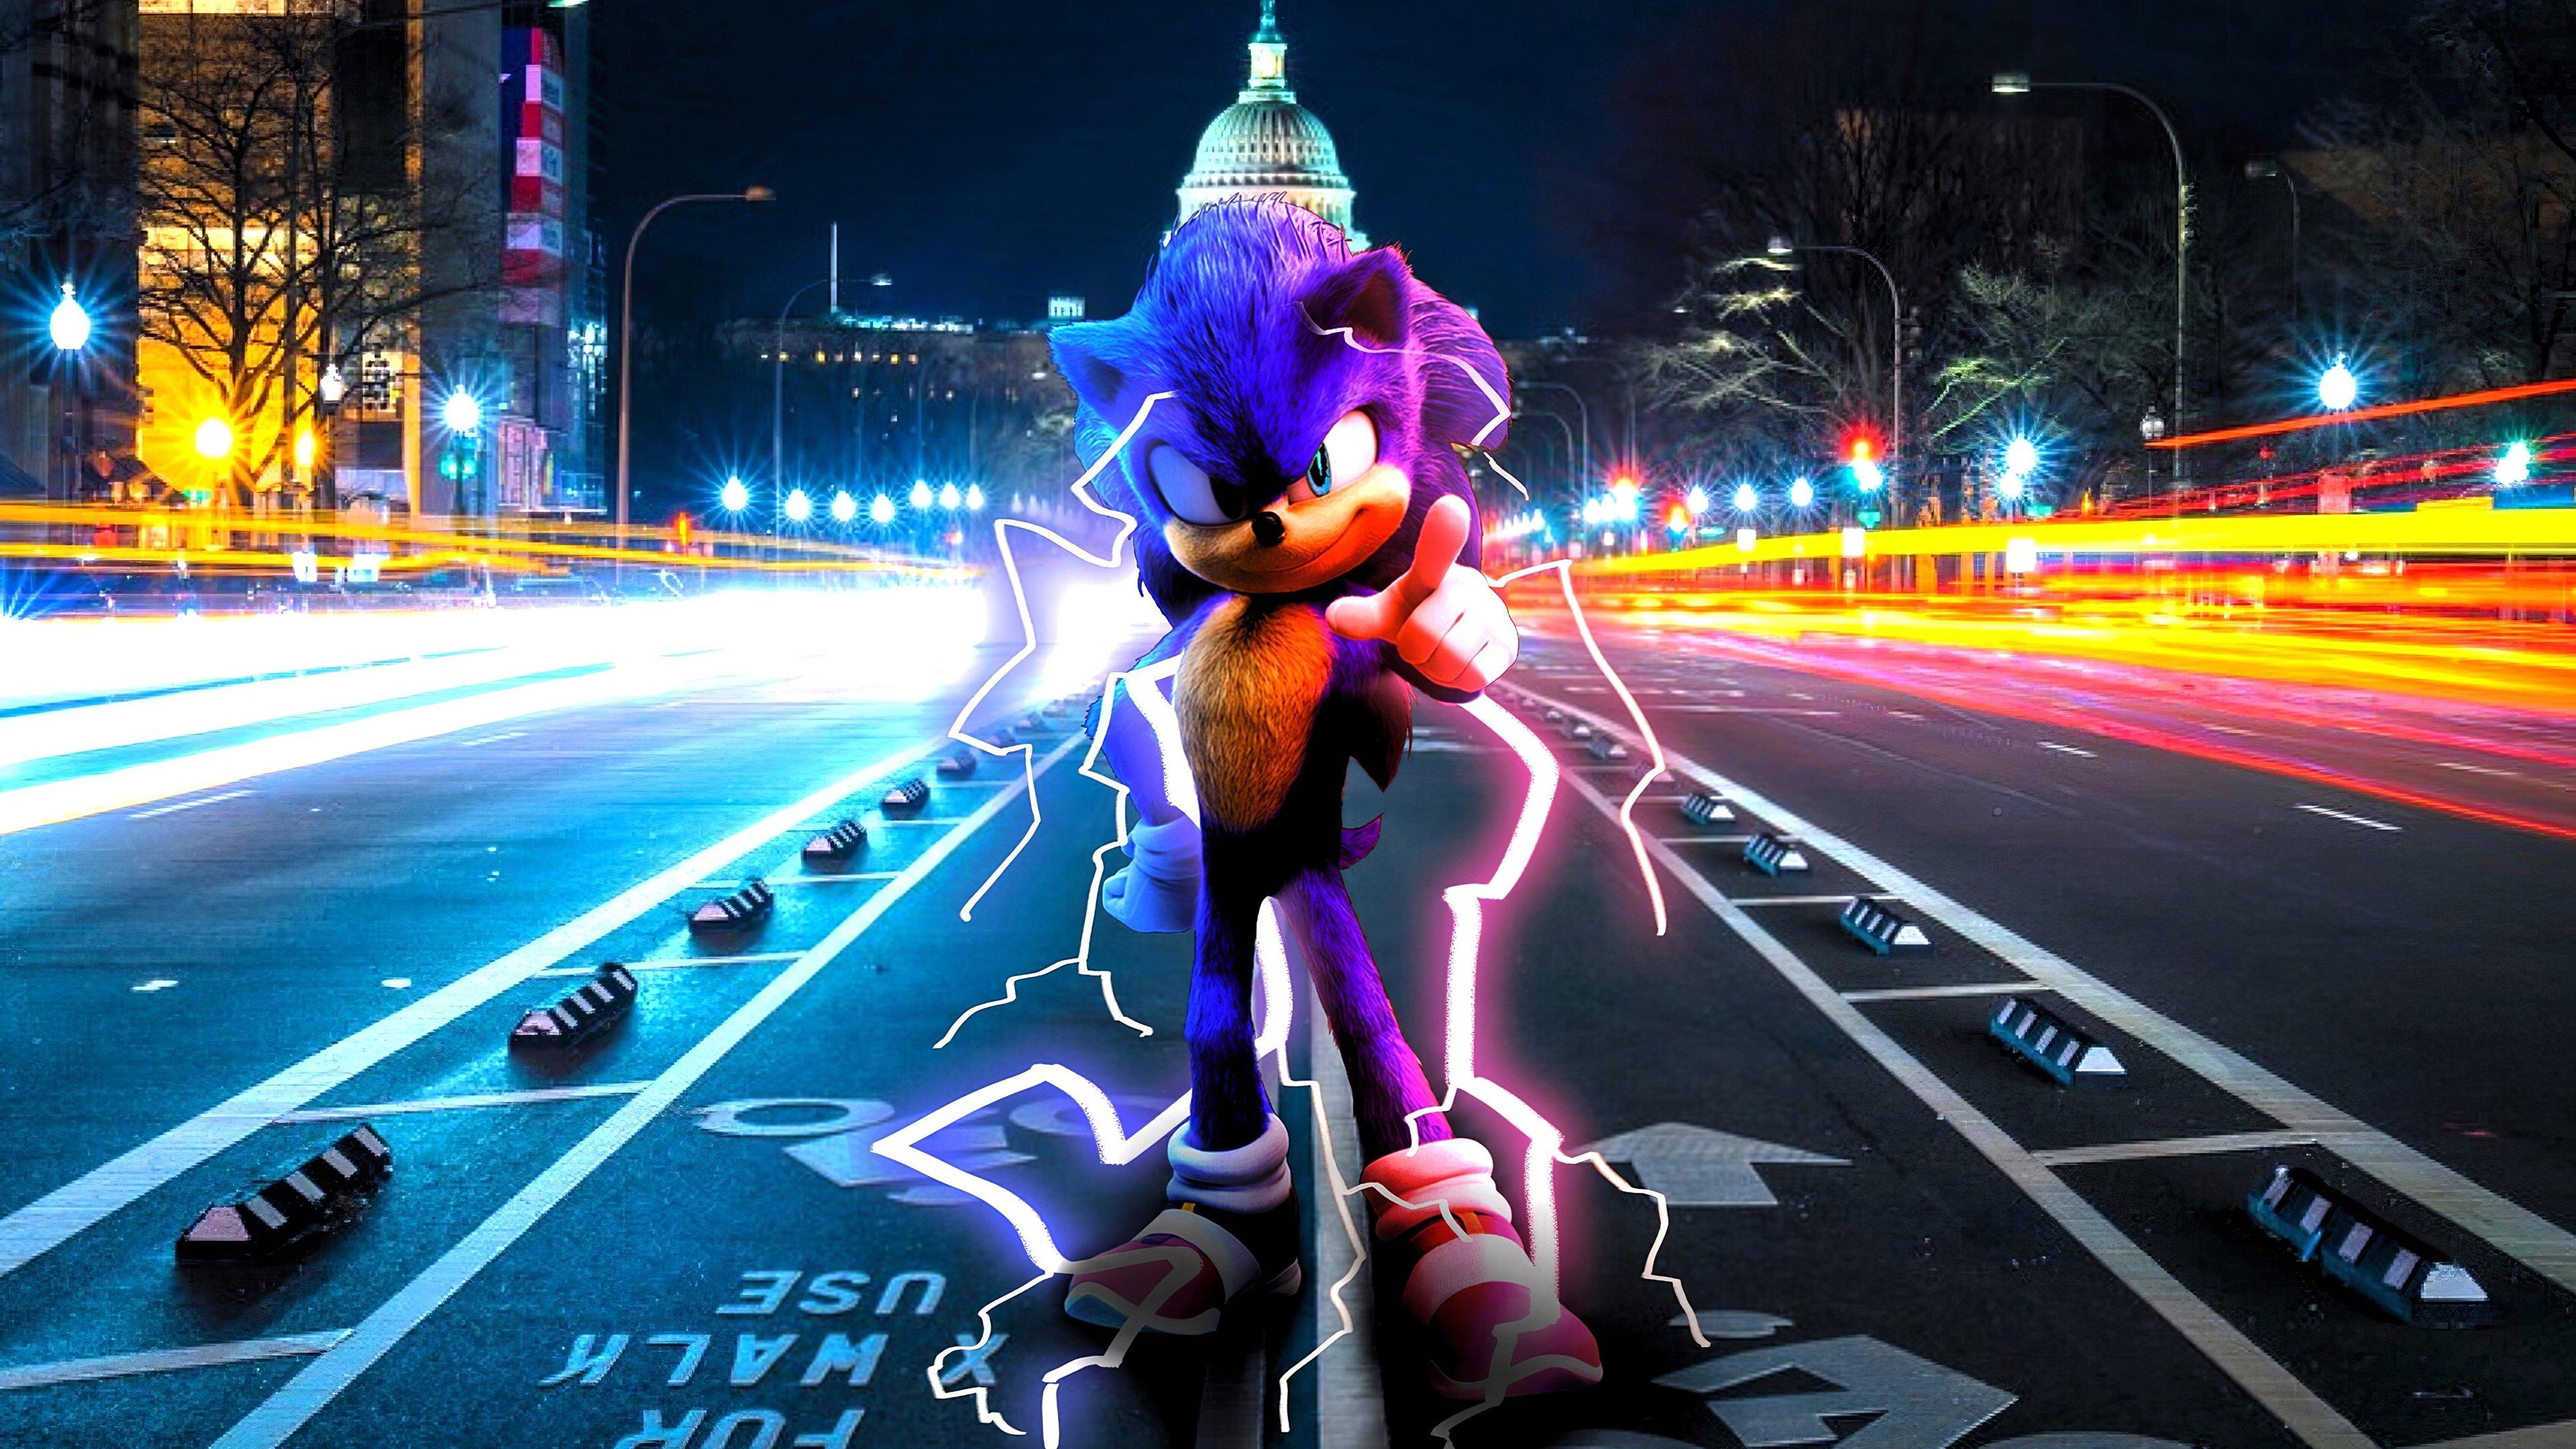 Sonic The Hedgehog Wallpaper 4k Ultra Hd Id 4856